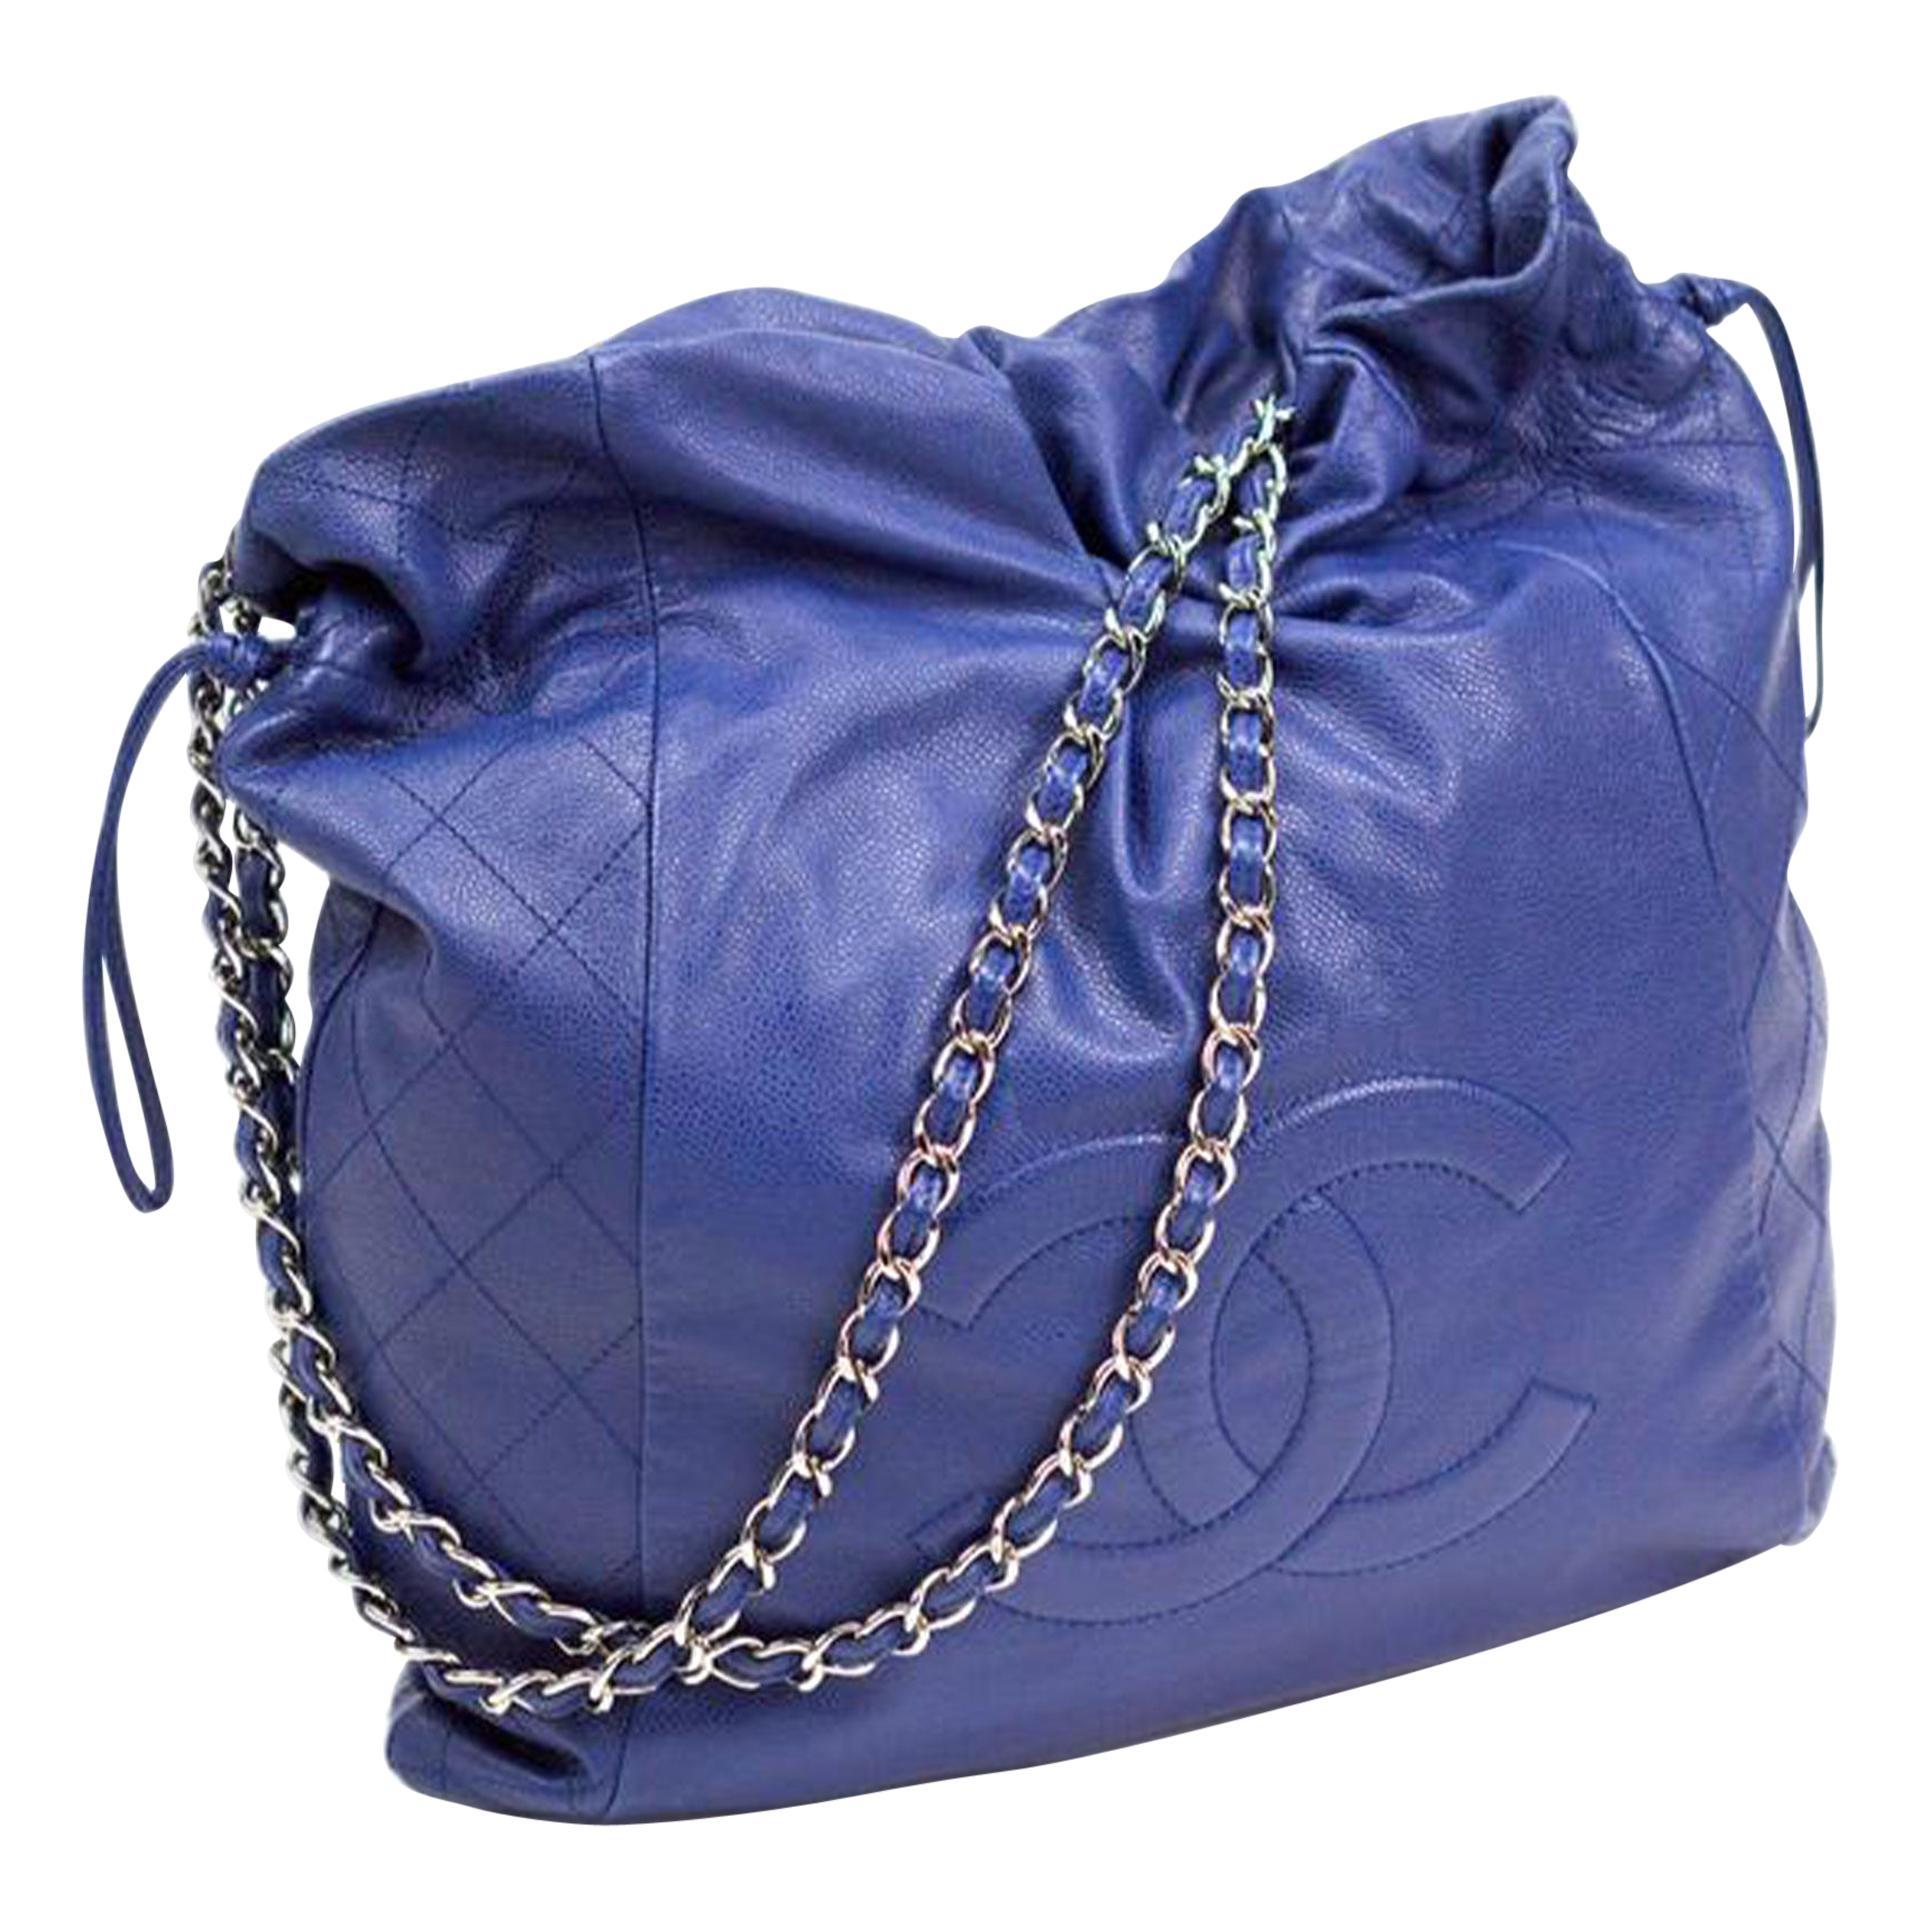 Chanel Timeless Bon Bon Cc Blue Caviar Leather Tote